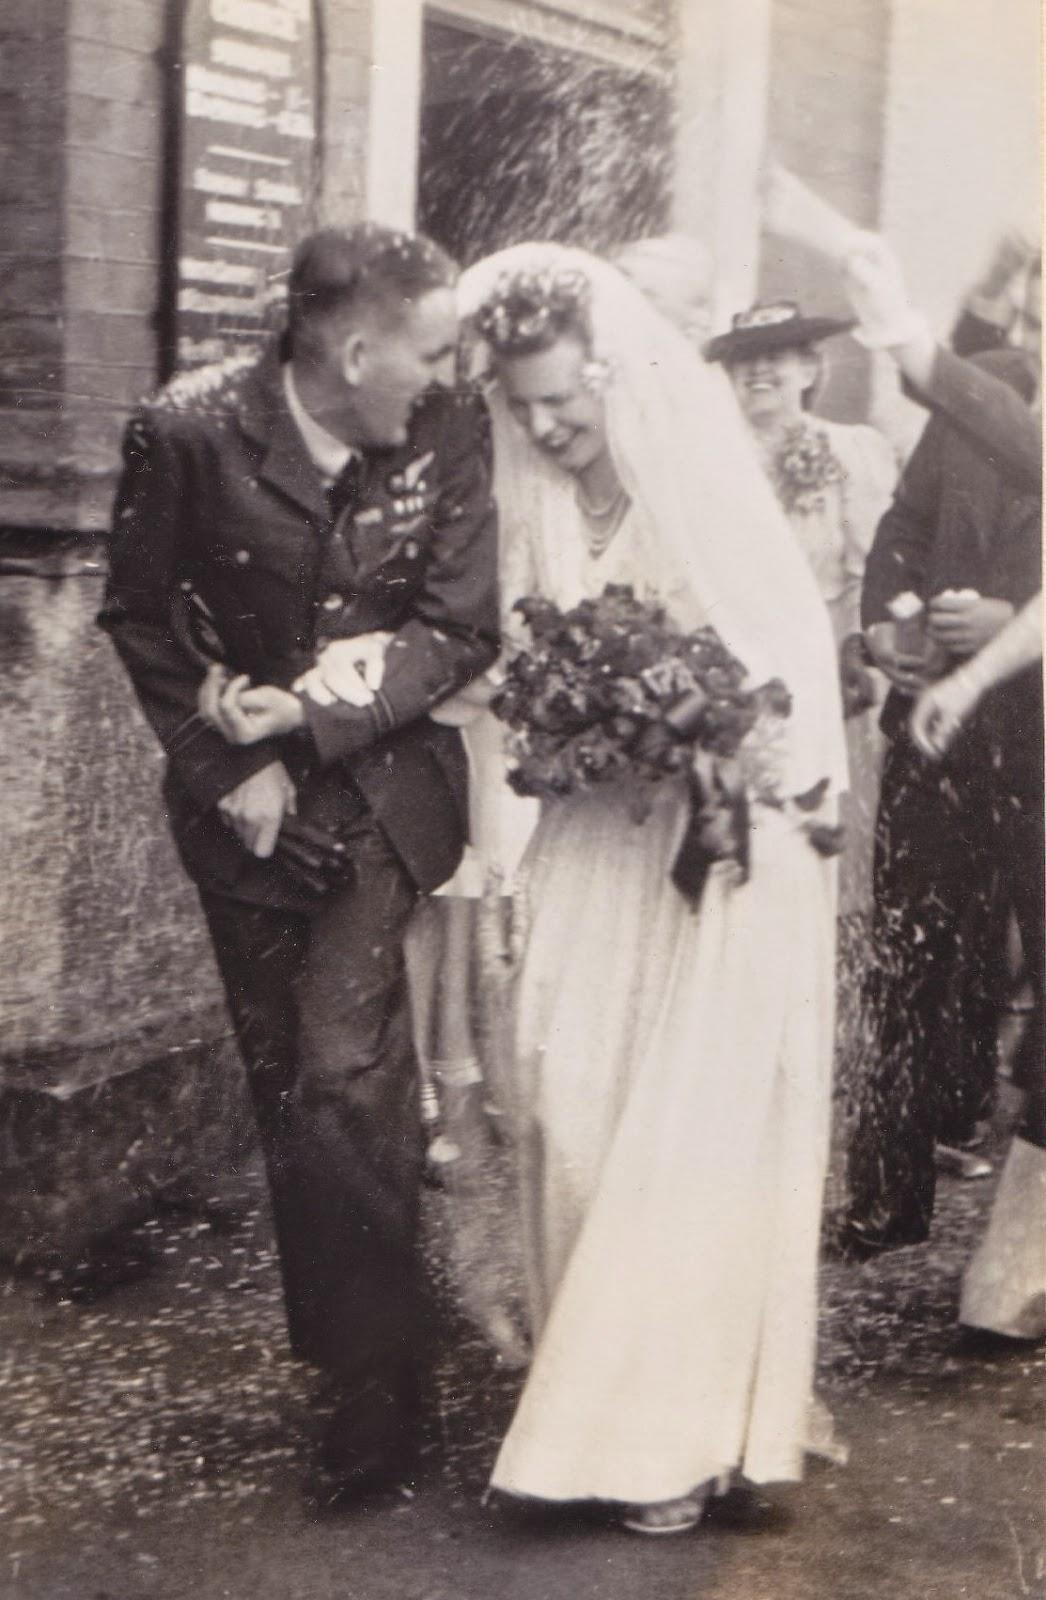 Edith and David in confetti storm in post WW2 frugal, Calvinist Dunedin